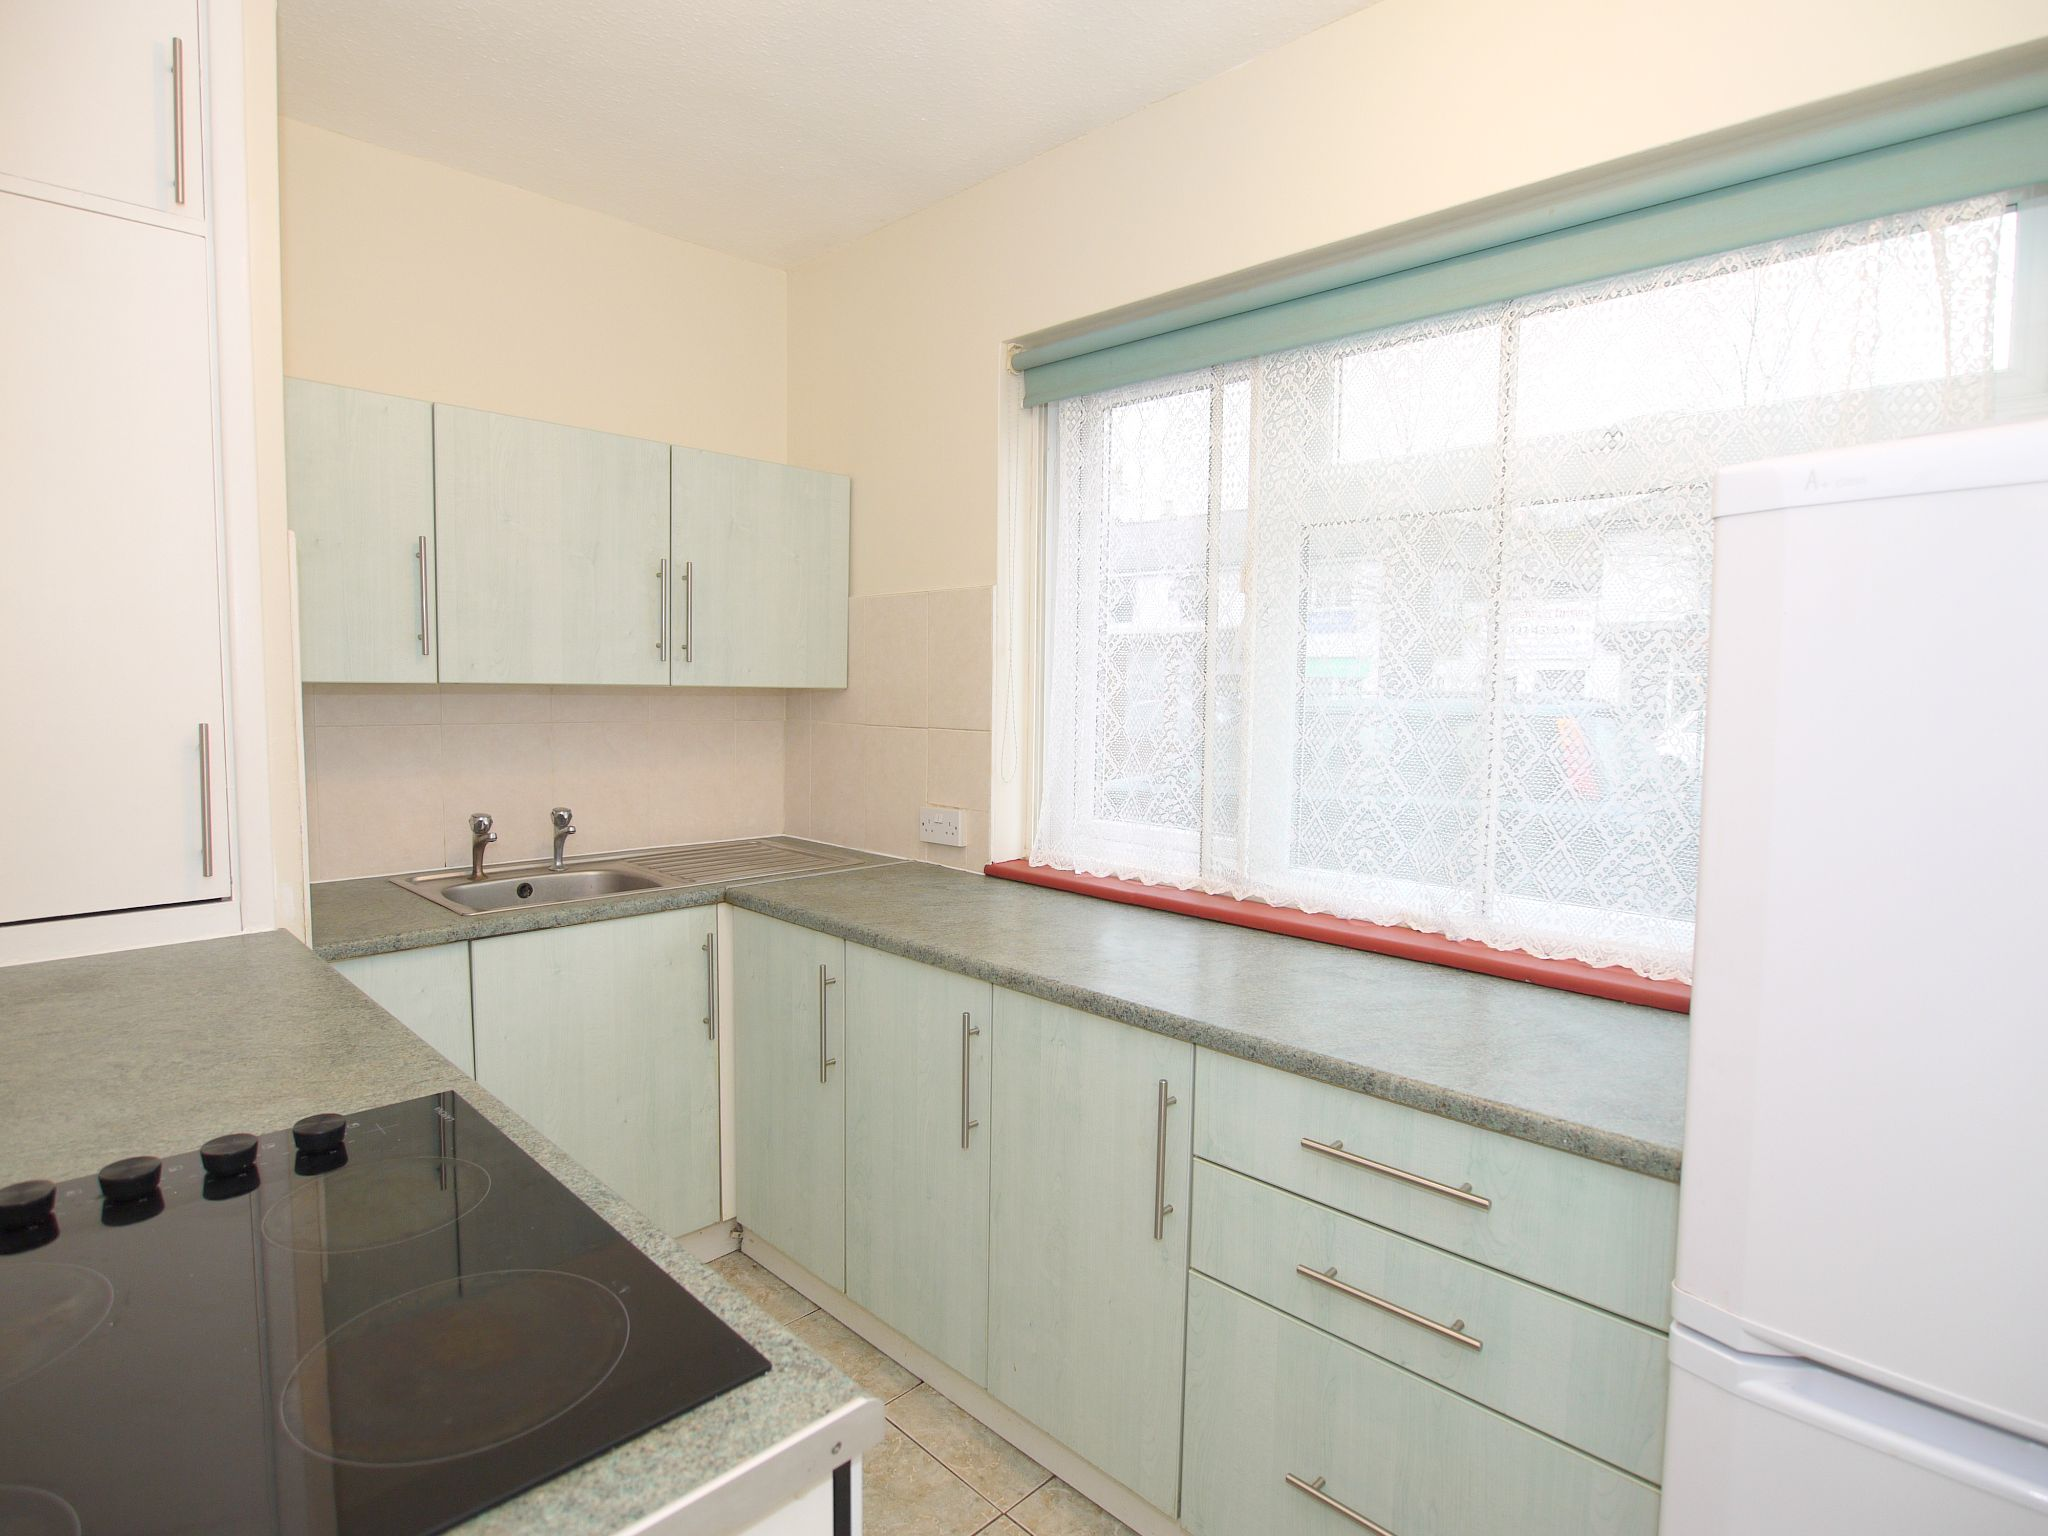 2 bedroom apartment flat/apartment For Sale in Sevenoaks - Photograph 5